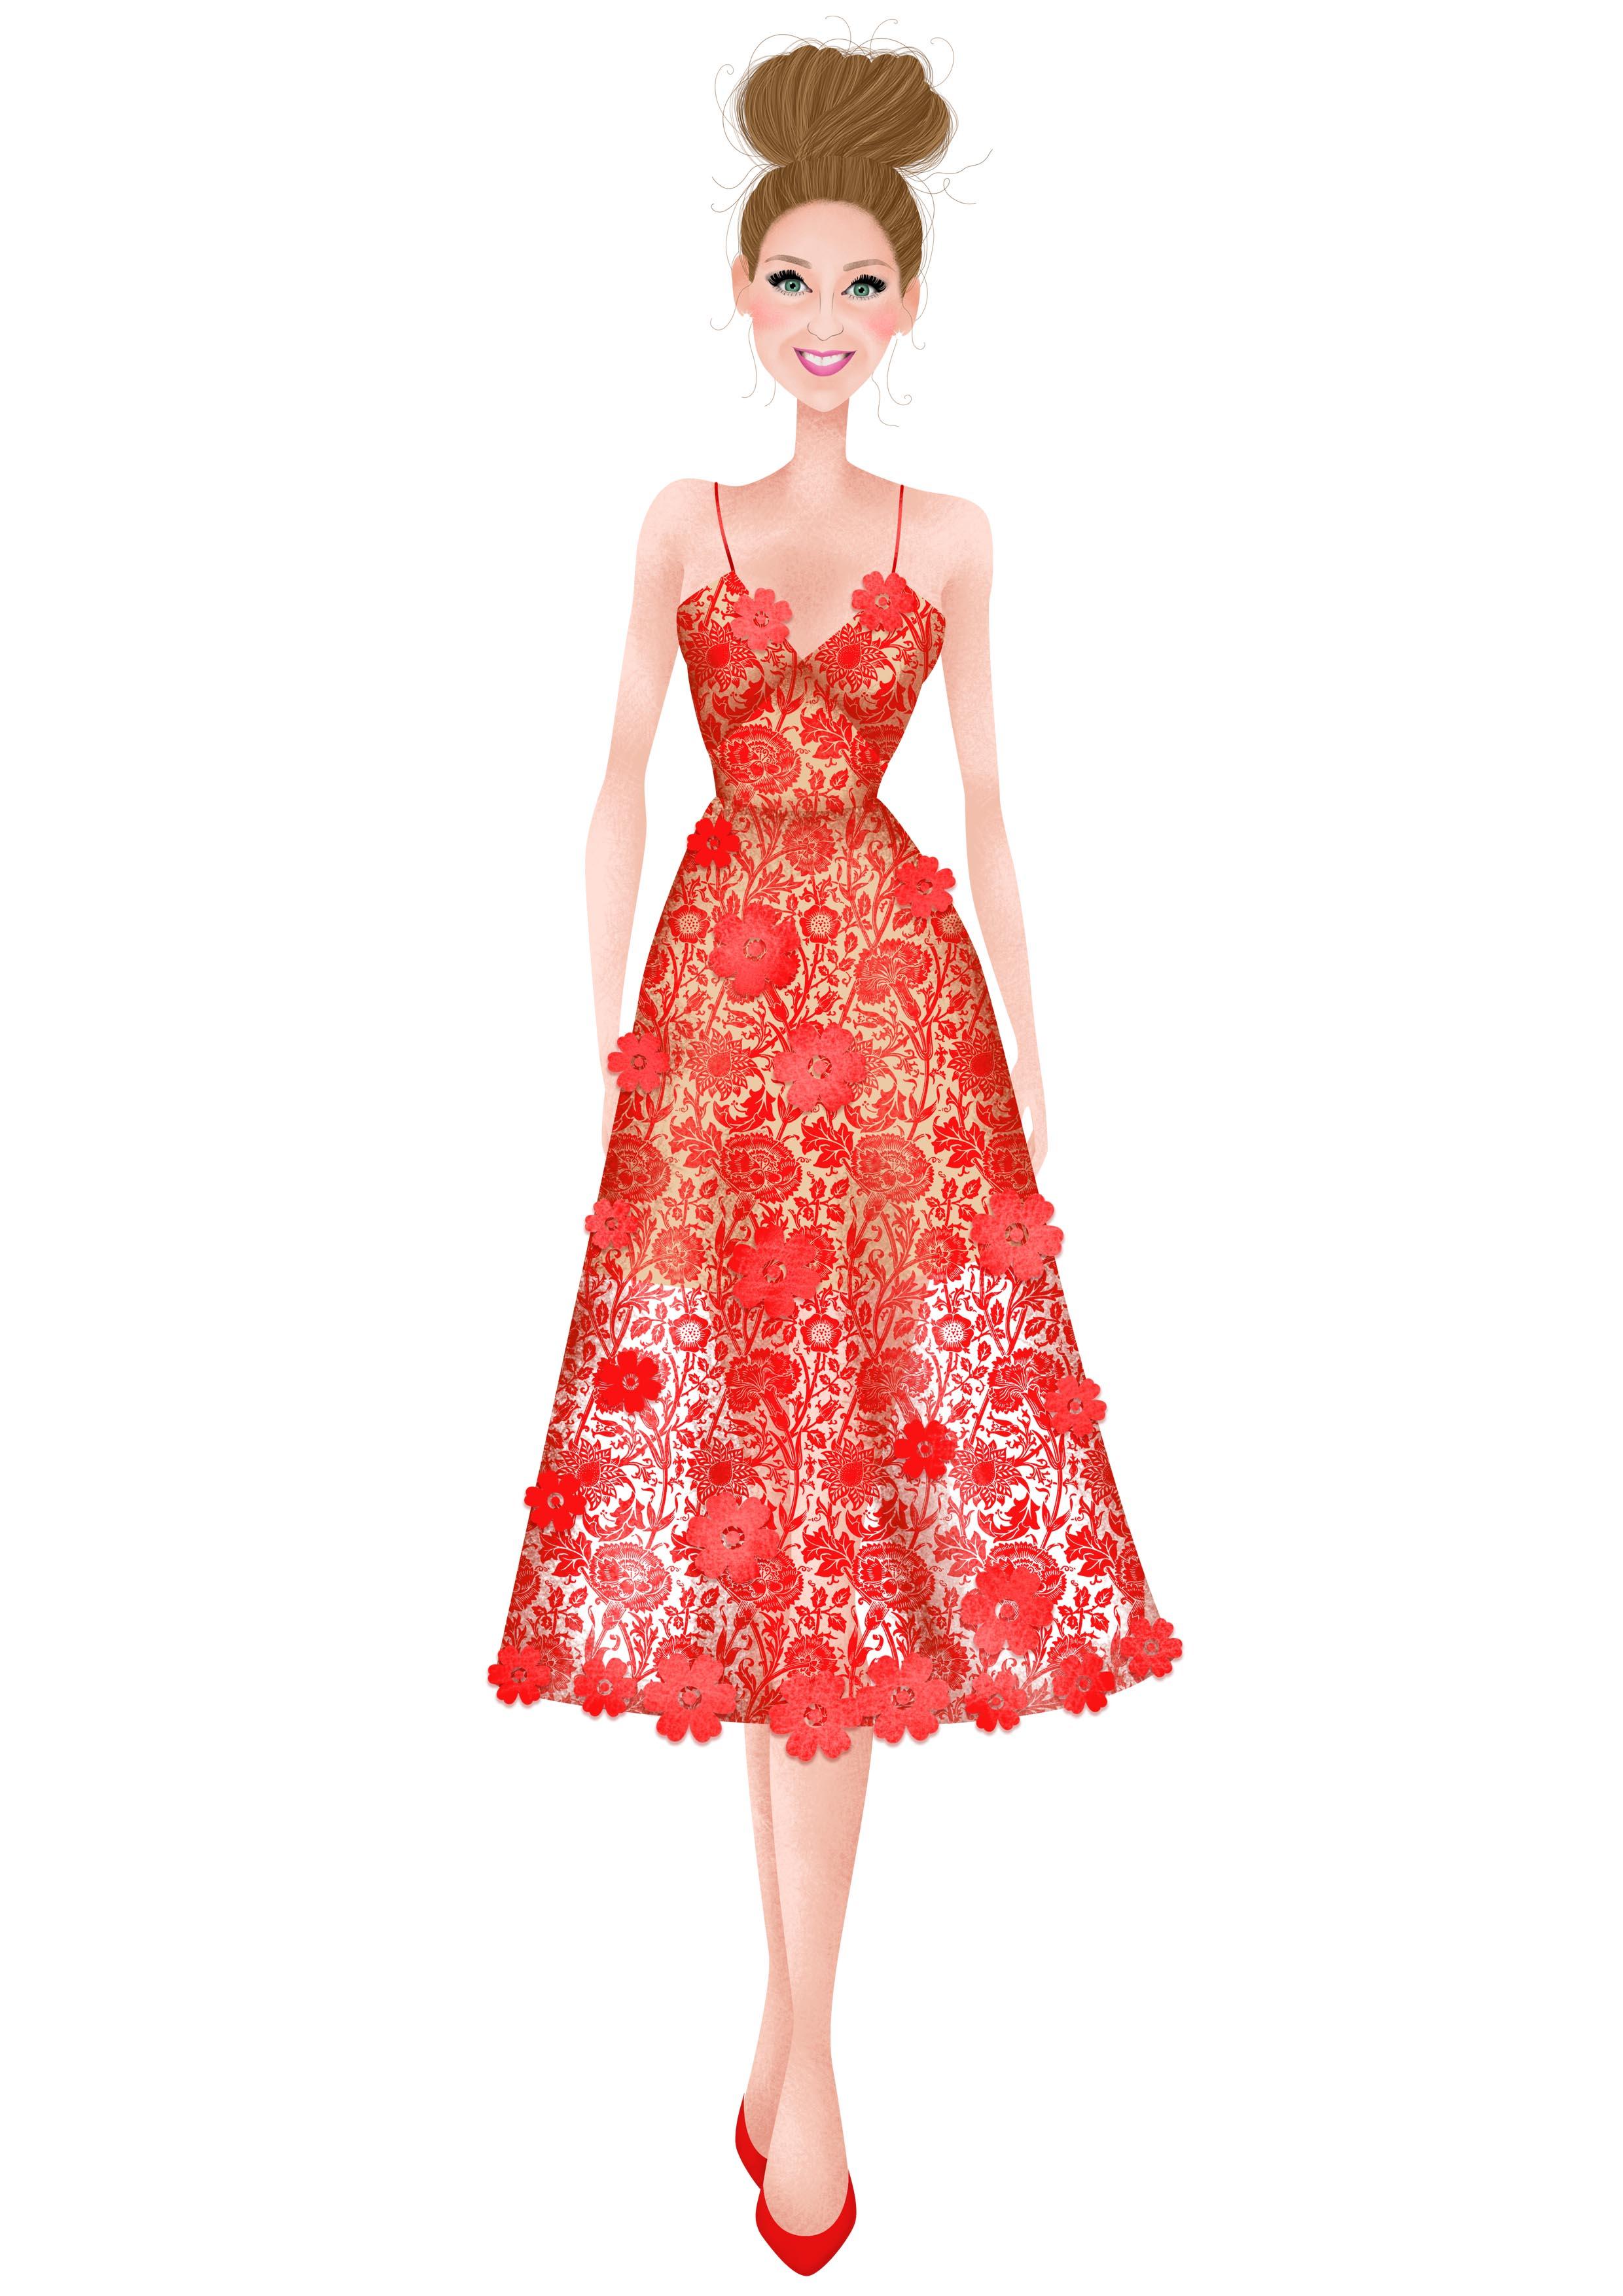 3D Floral Azalea Dress in Tomato Red  by Self-Portrait